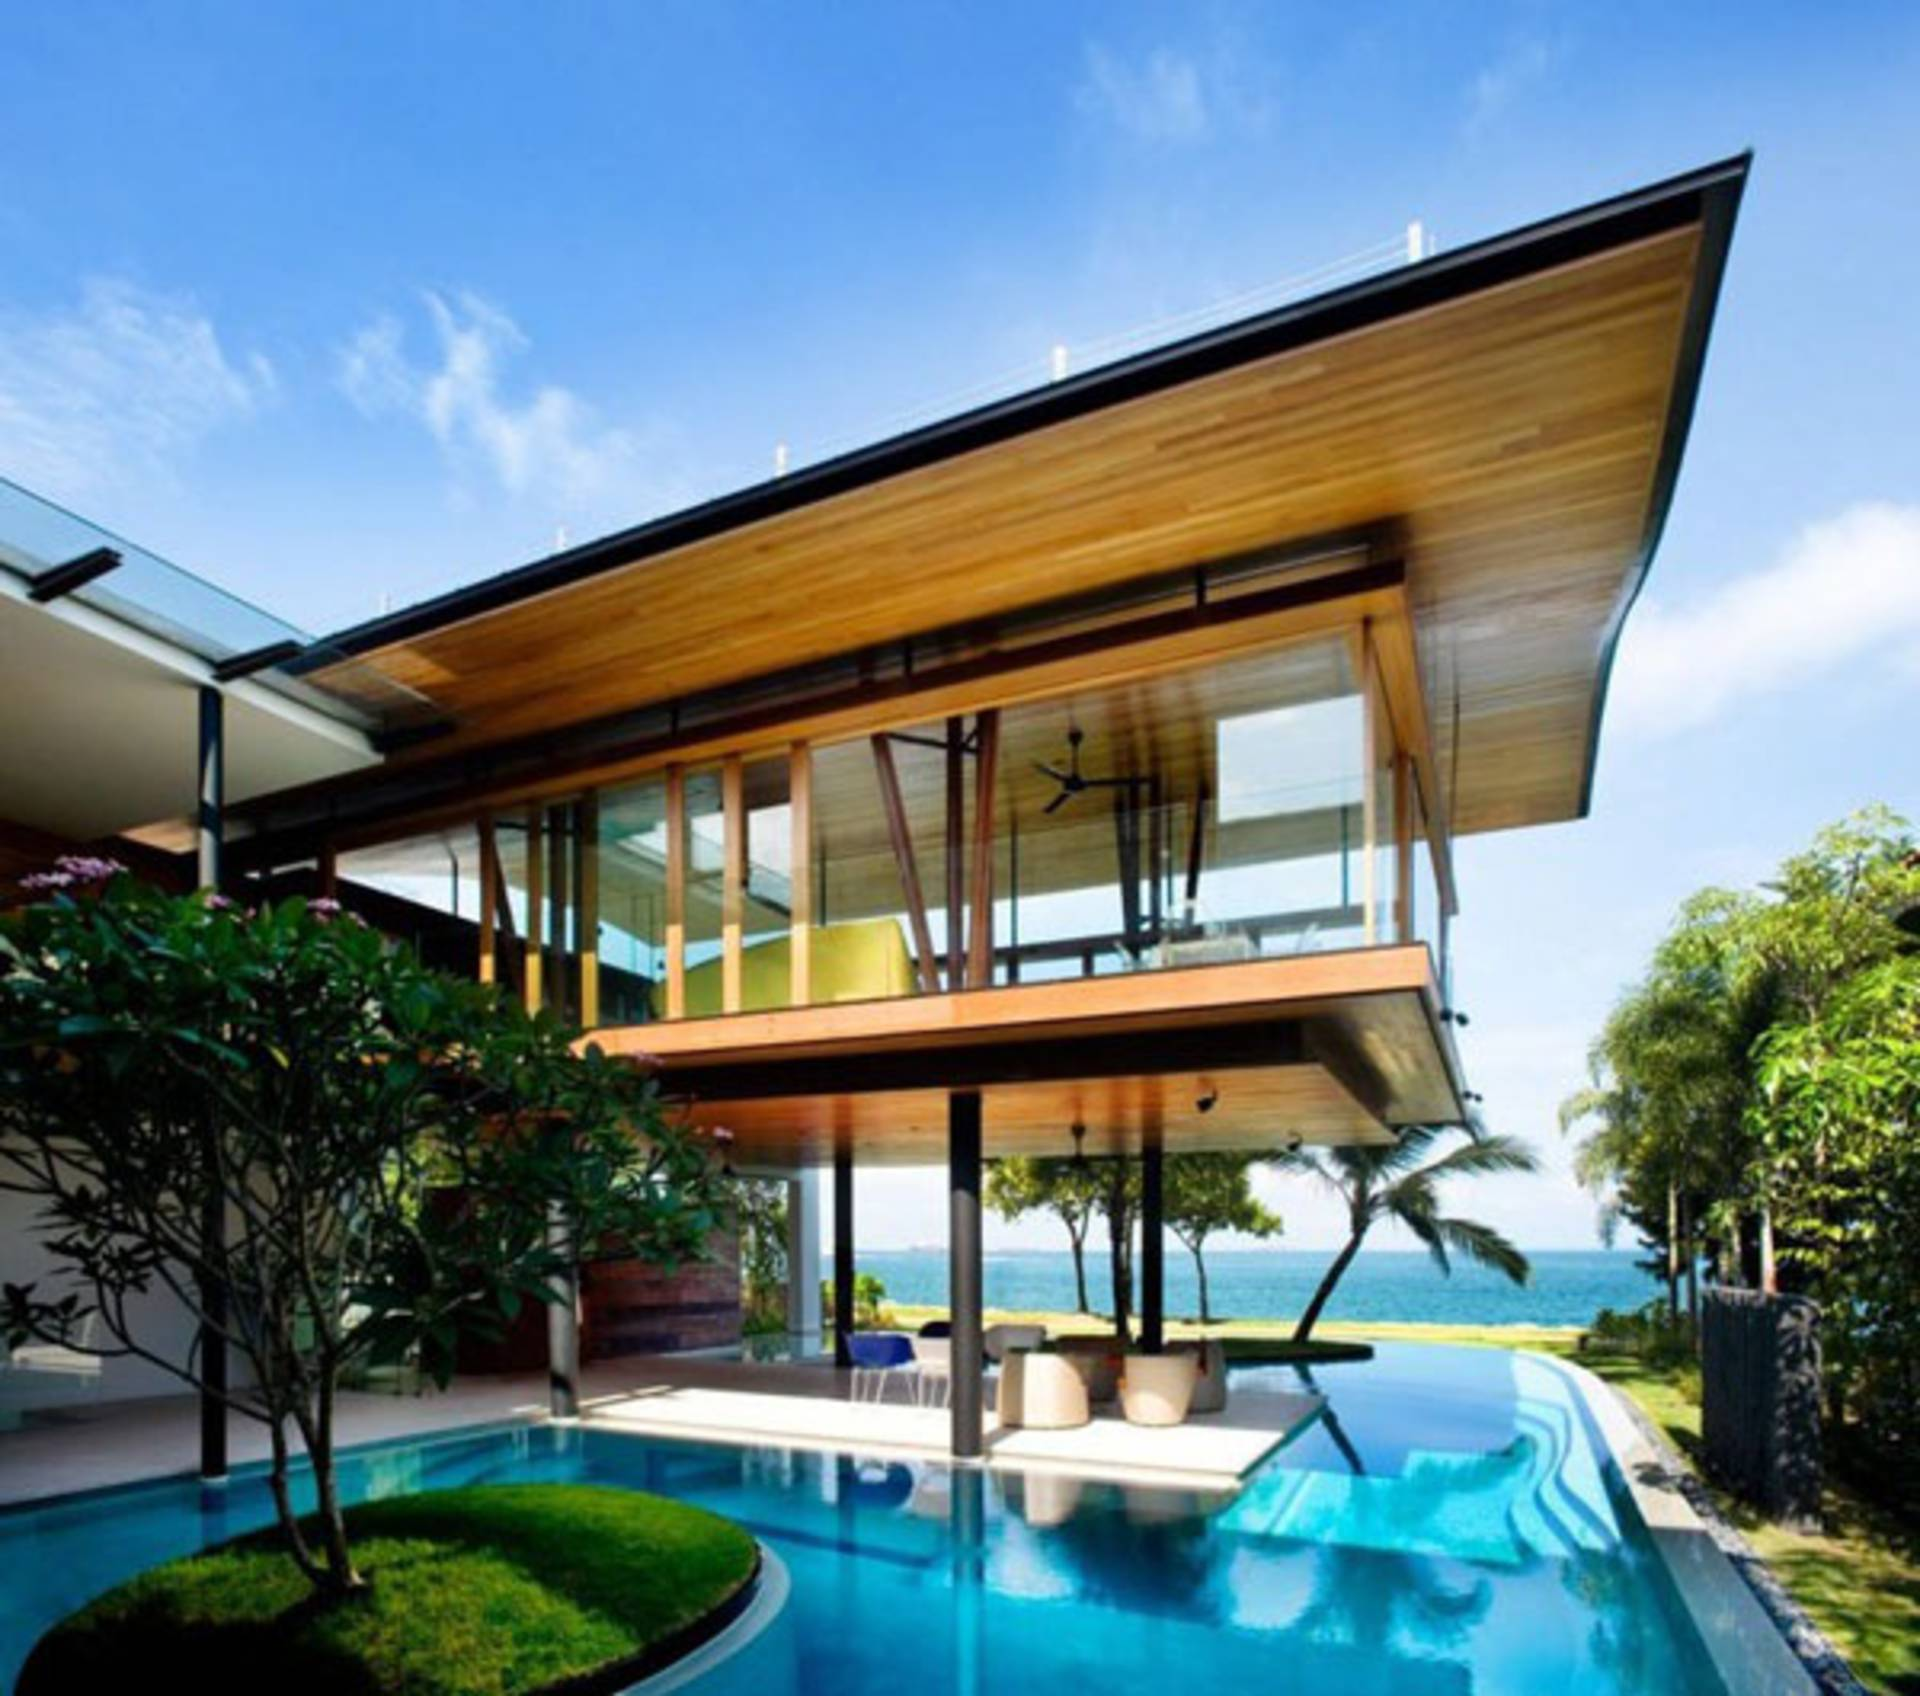 Luxury Seaside Home by Guz Architects - beachfront homes - luxury coastal homes - fish house